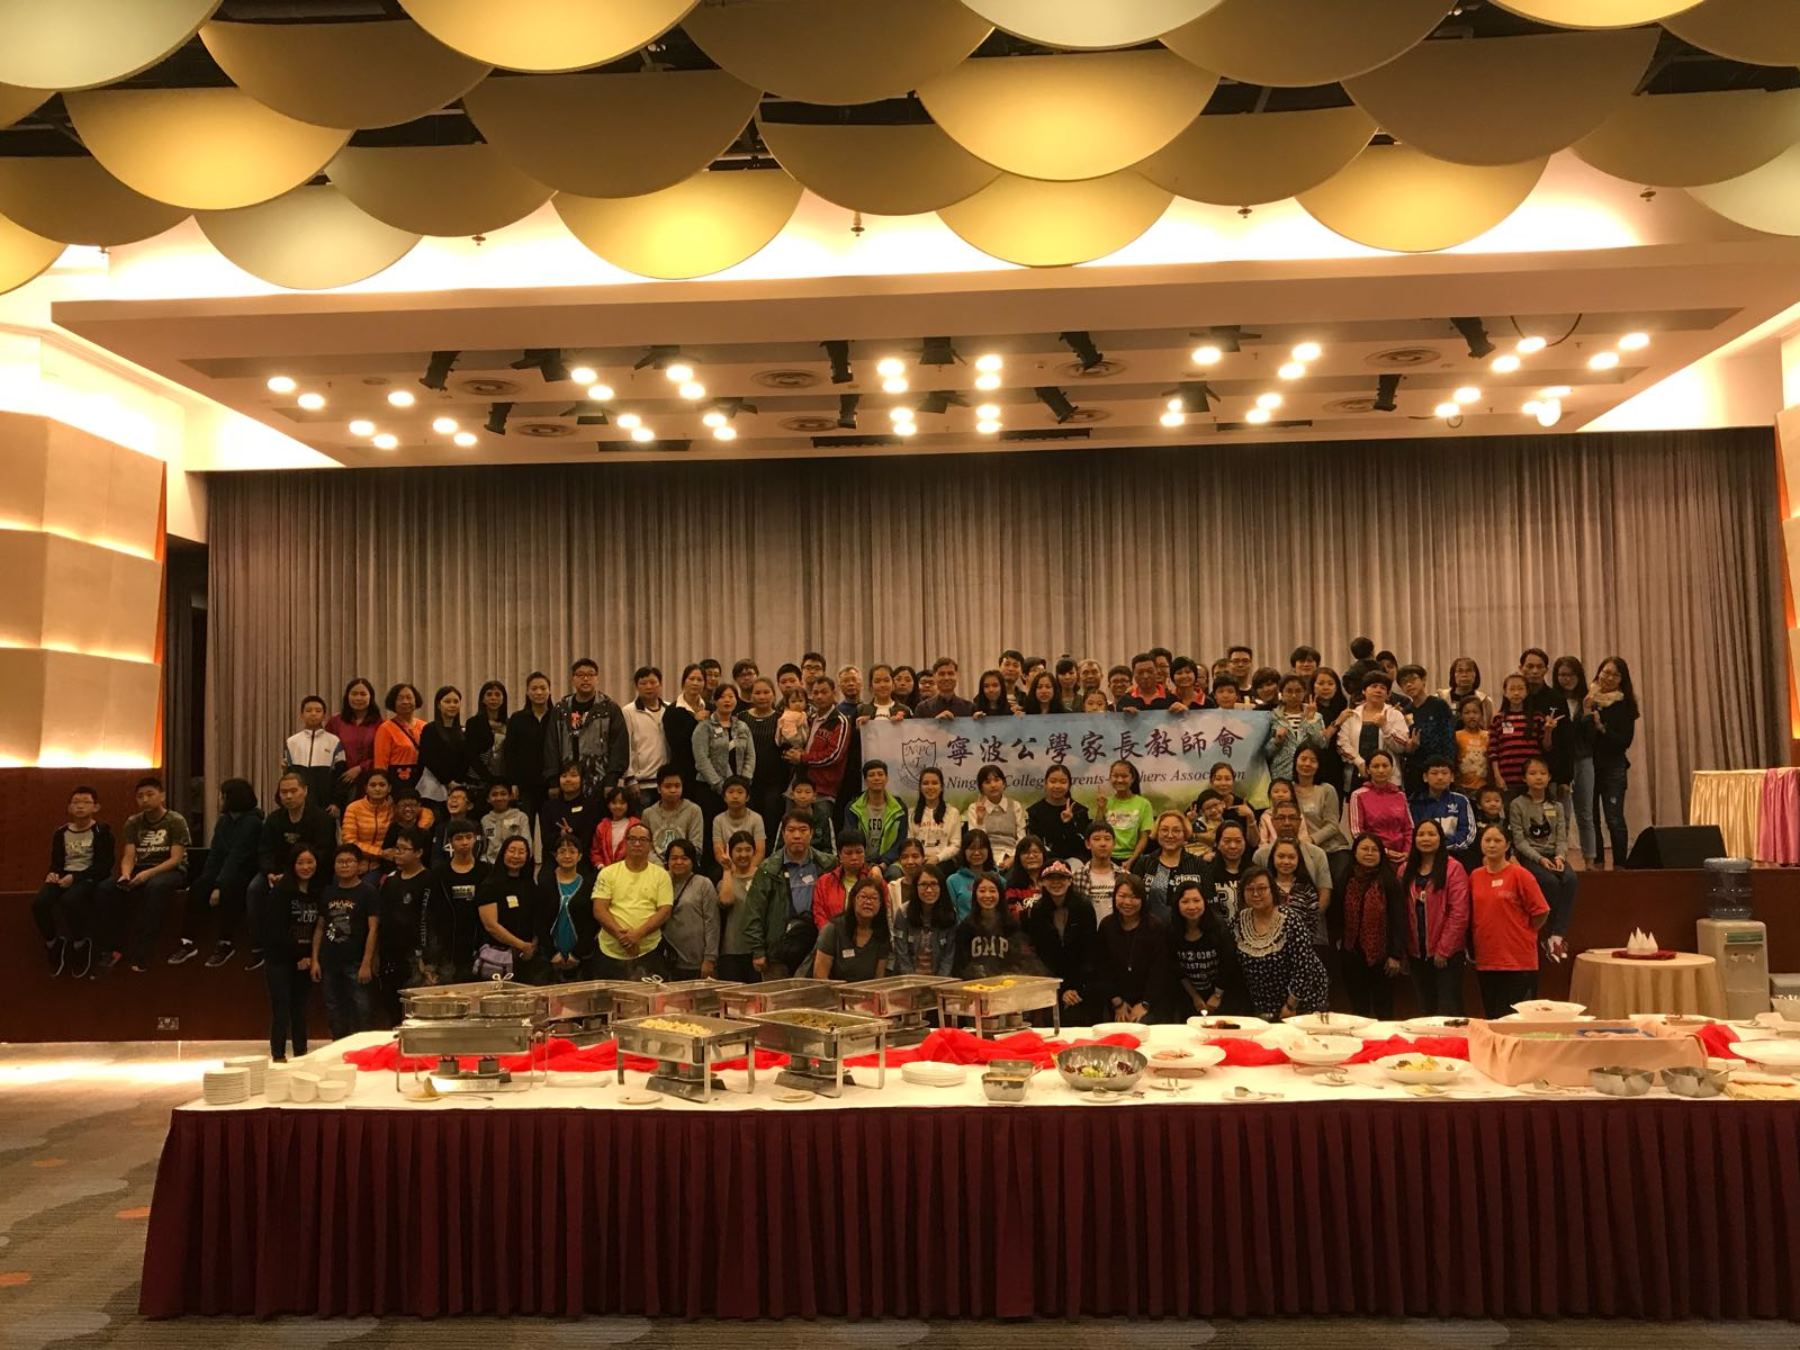 http://npc.edu.hk/sites/default/files/img-20171119-wa0039.jpg